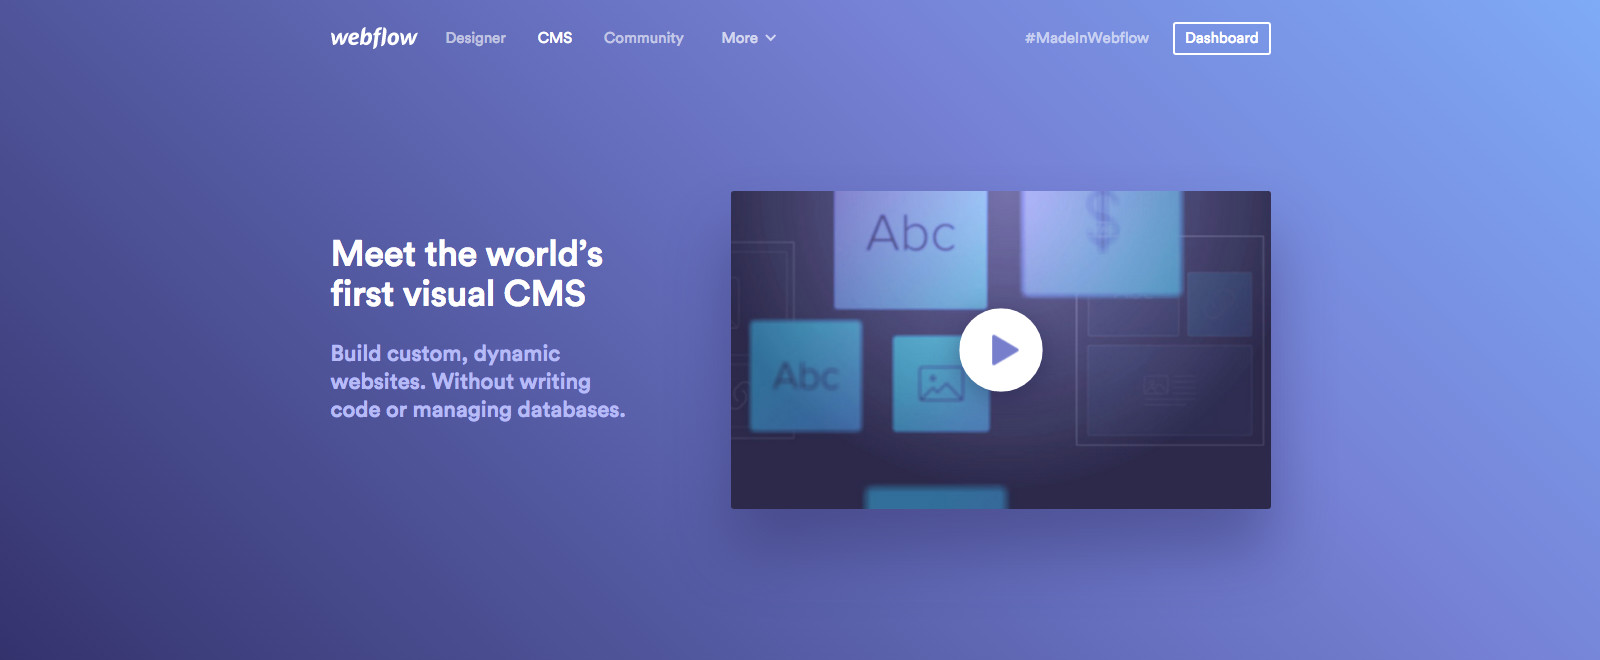 Webflow CMS